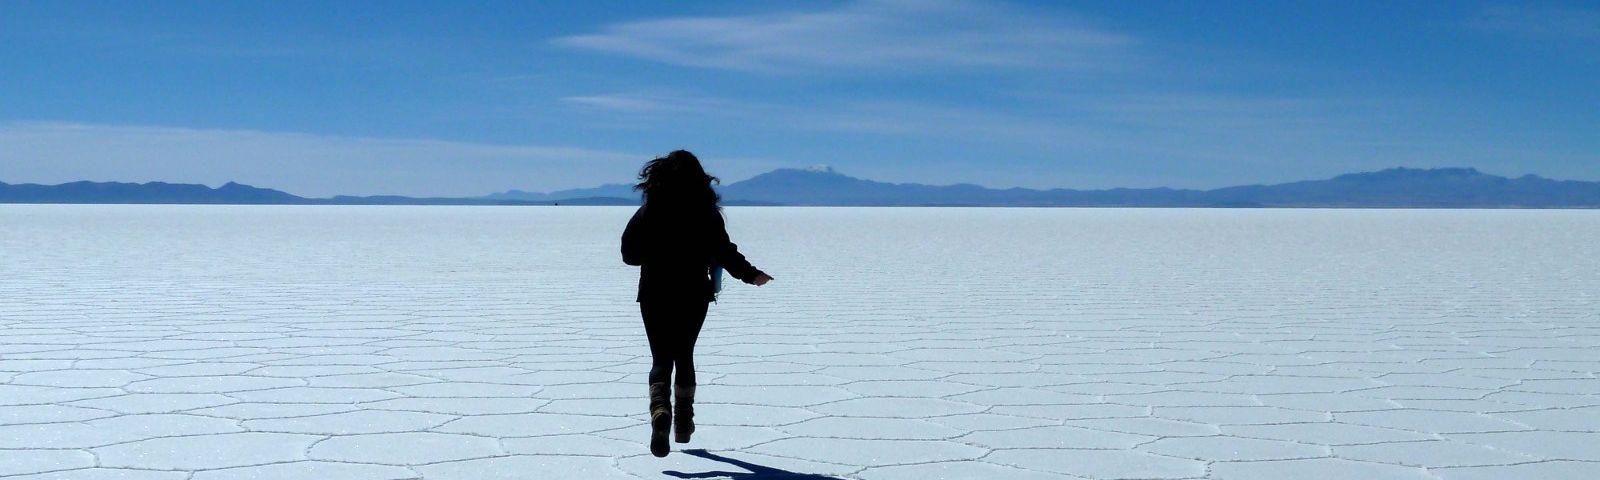 Run across the Uyuni Salt Flats in Bolvia